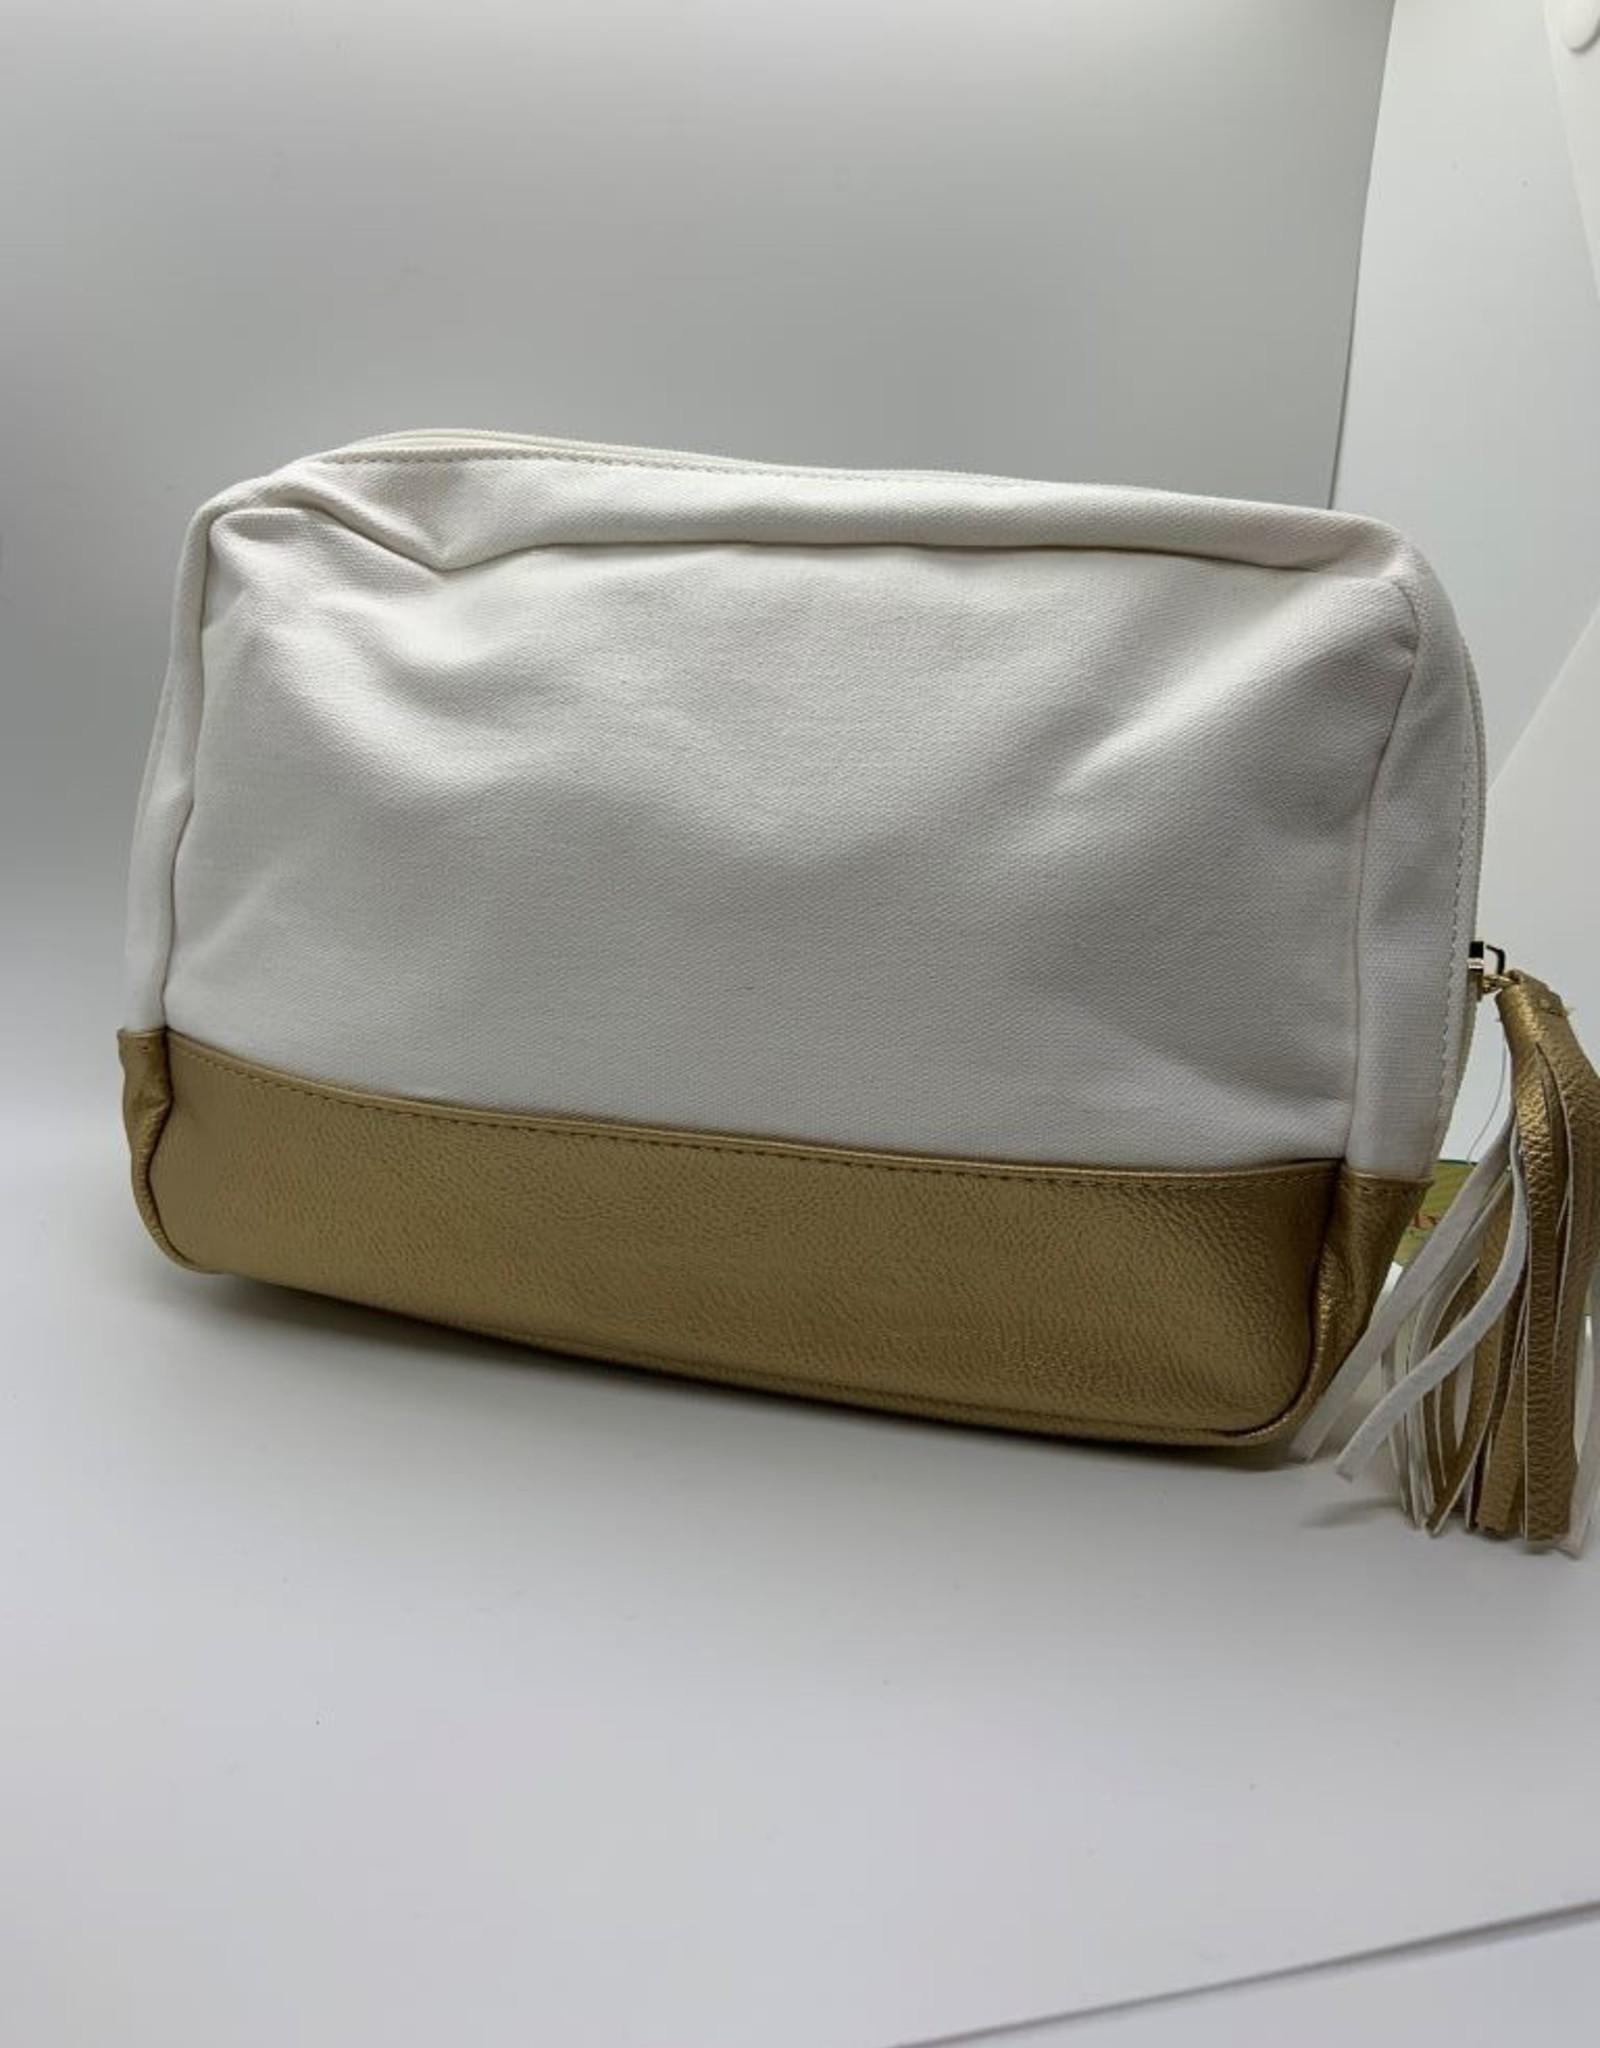 Viv & Lou Cabana Cosmetic Bag